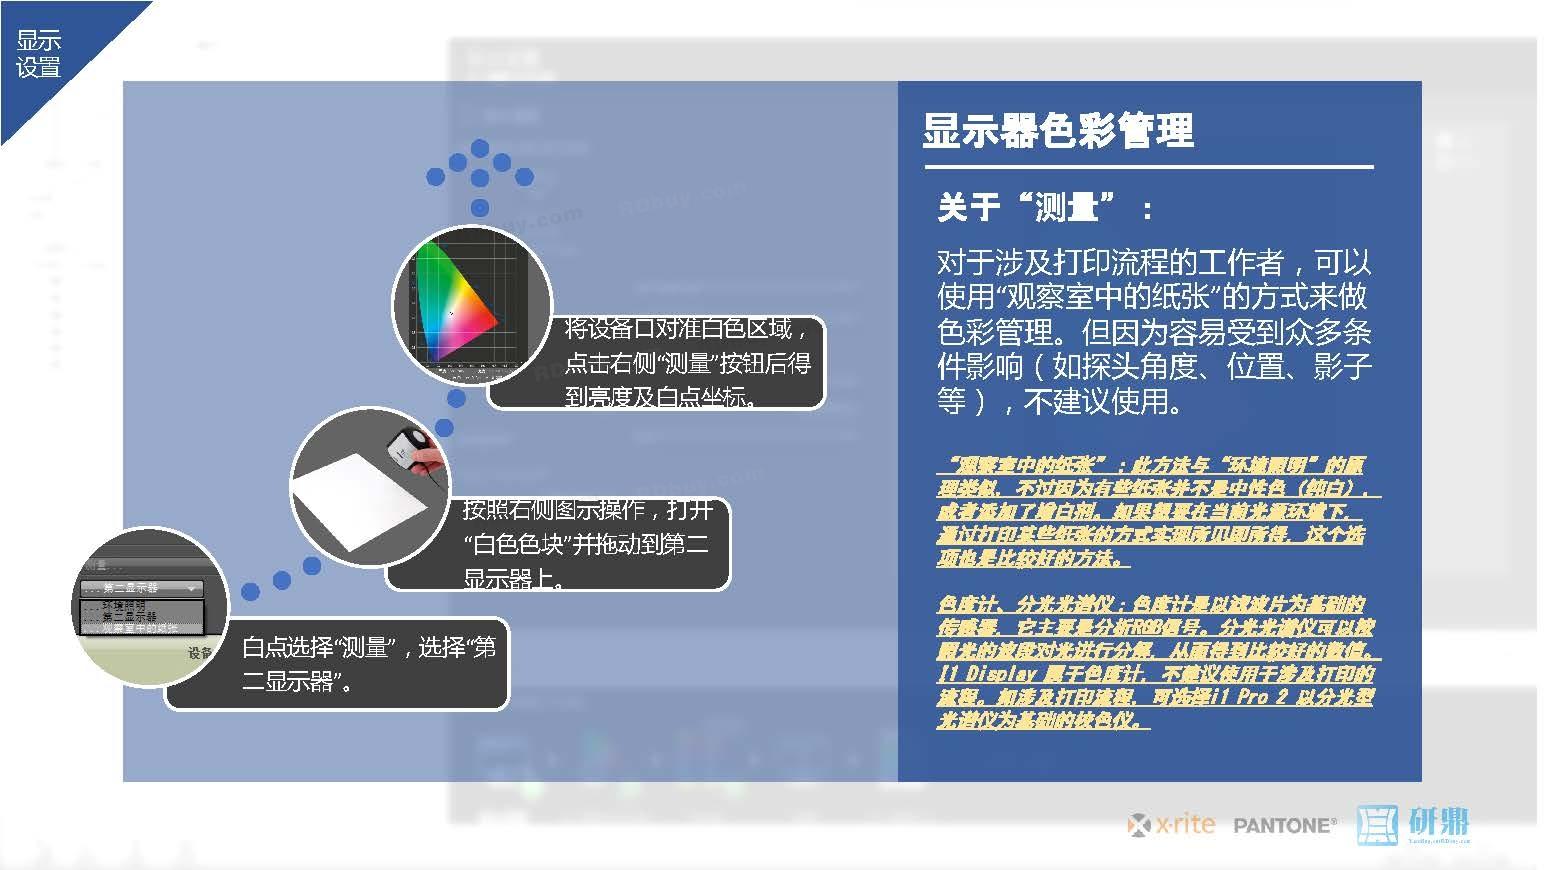 X-rite使用教程· - 加水印_页面_27.jpg